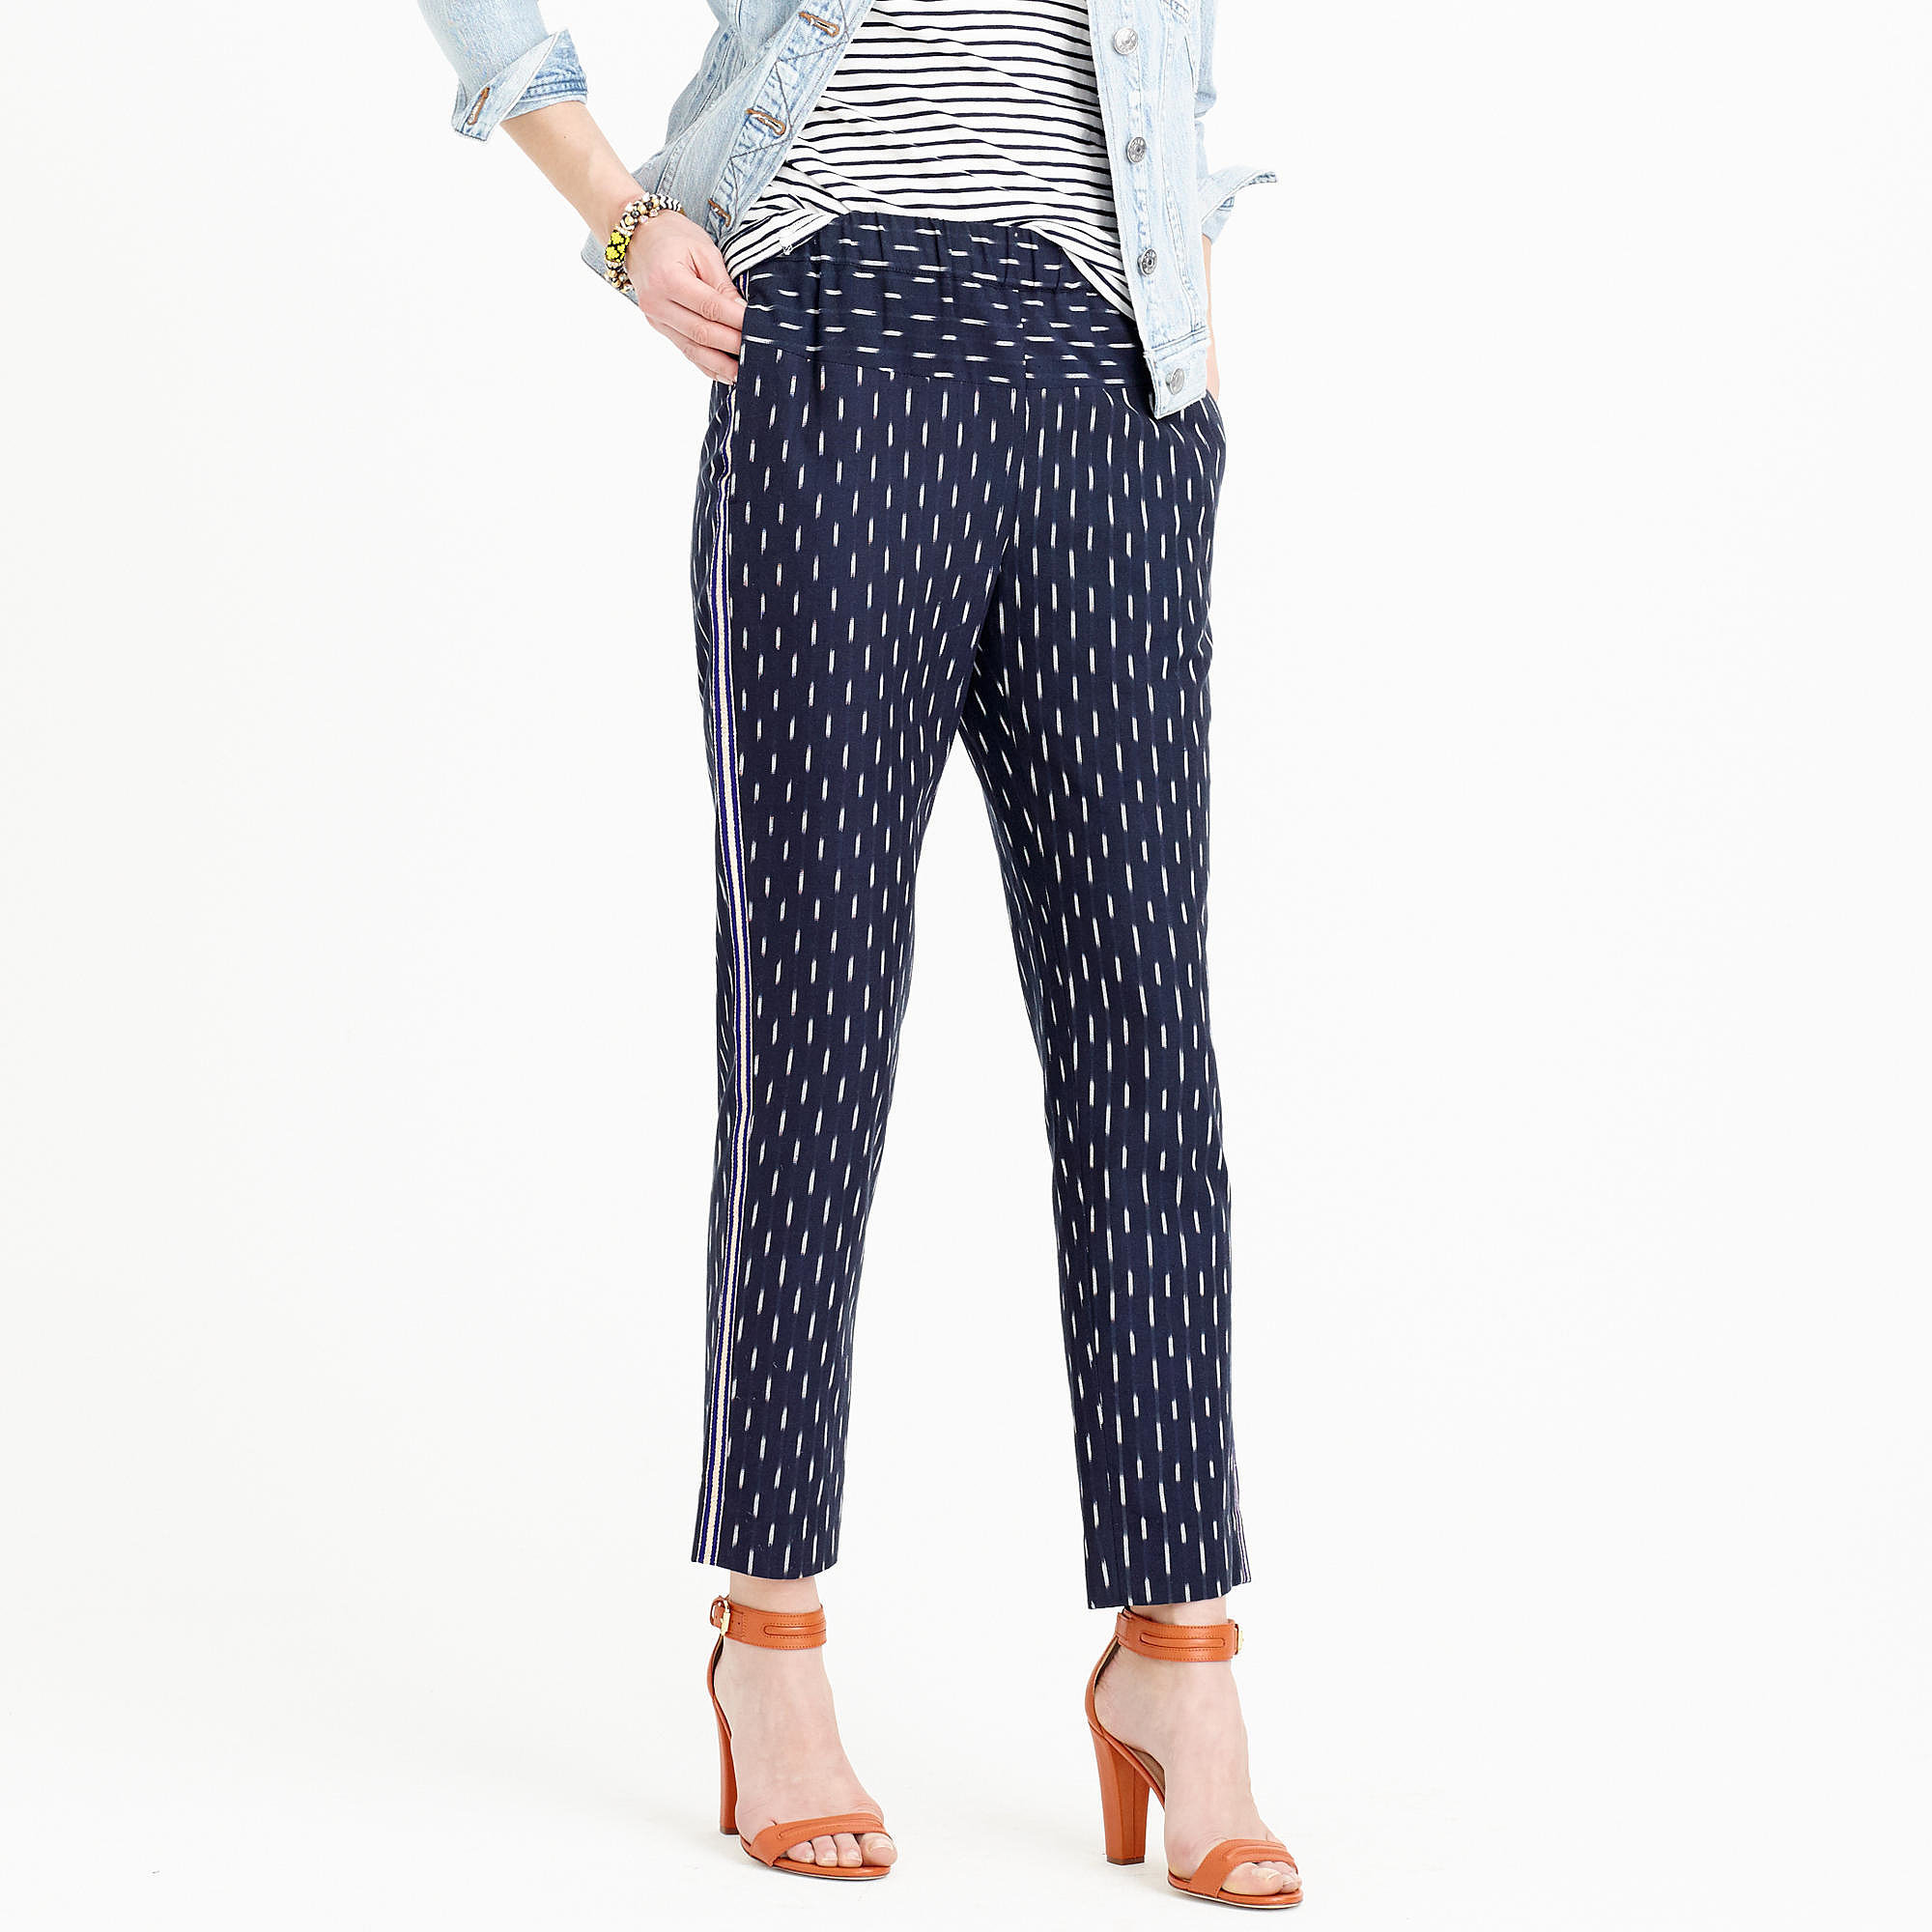 J.Crew Pull-on ikat pant with metallic tux stripes ($98)